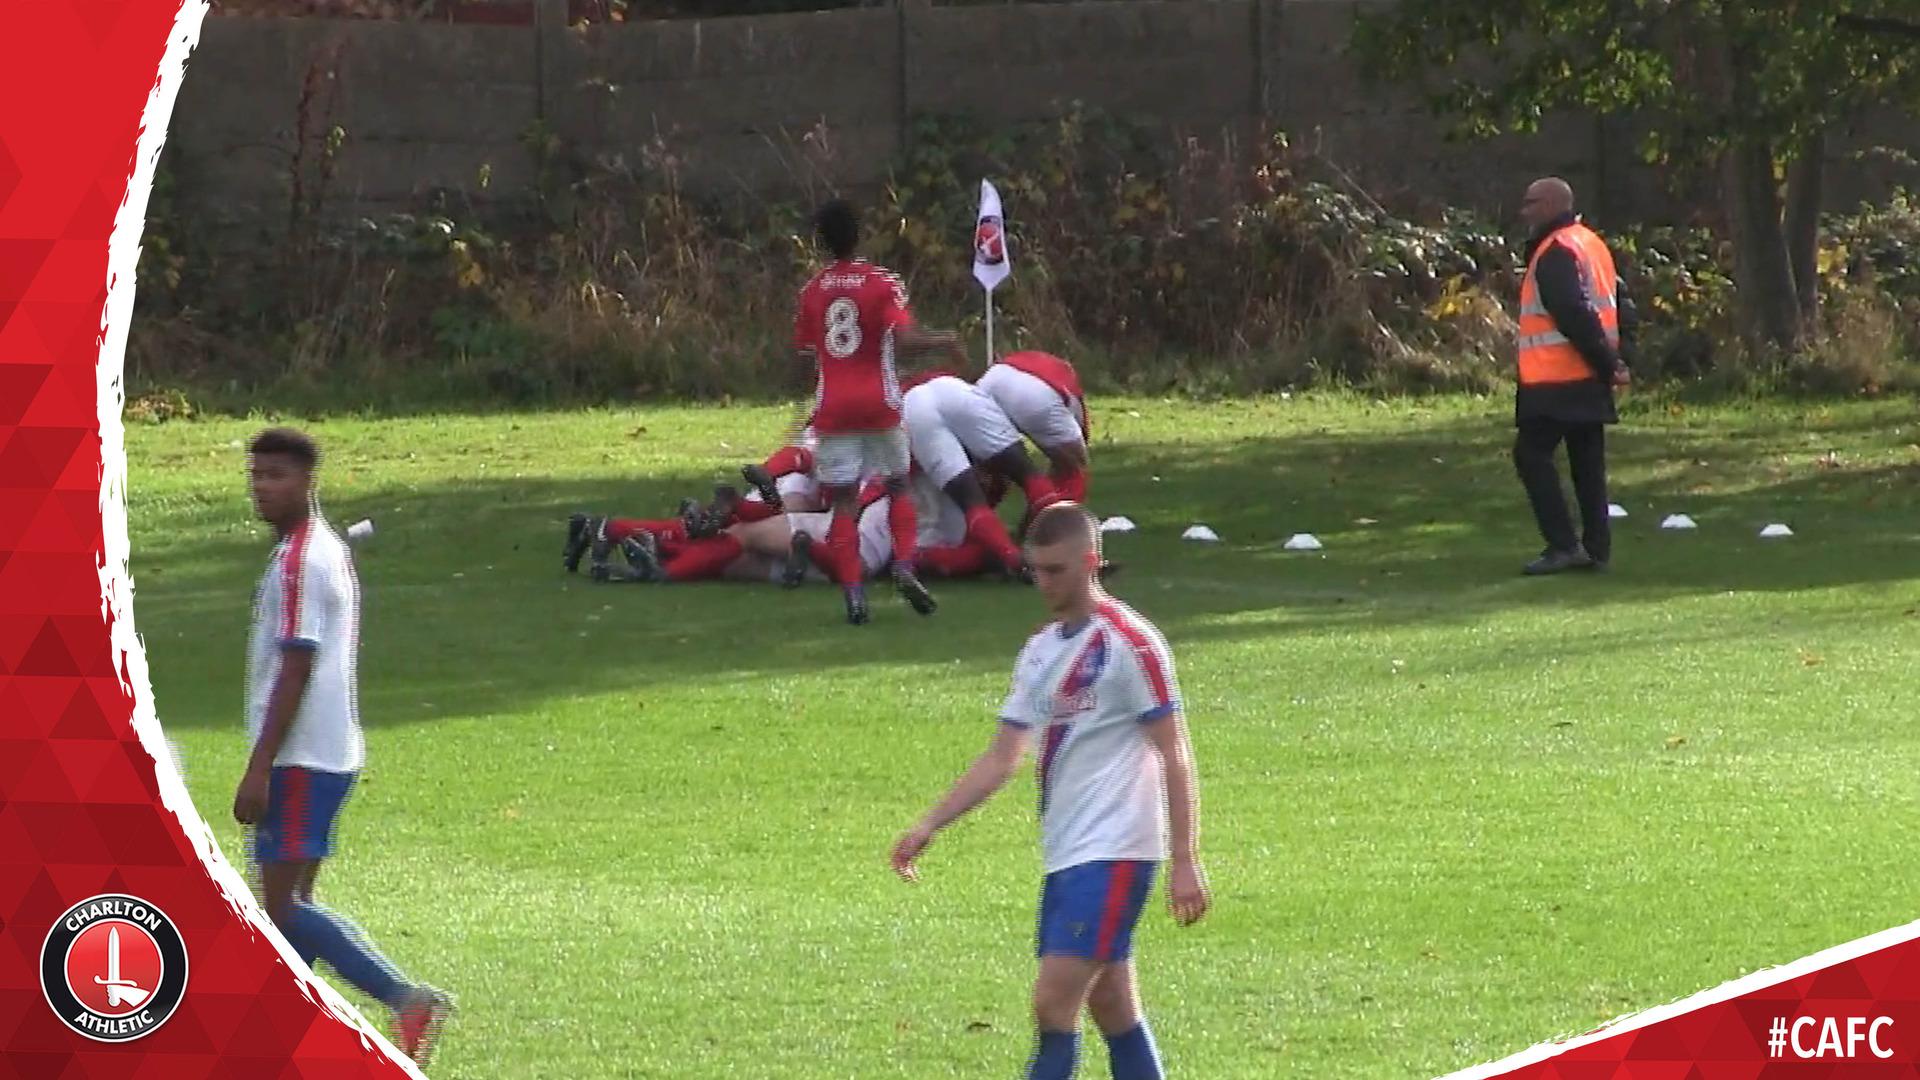 U18S HIGHLIGHTS | Charlton 2 Crystal Palace 1